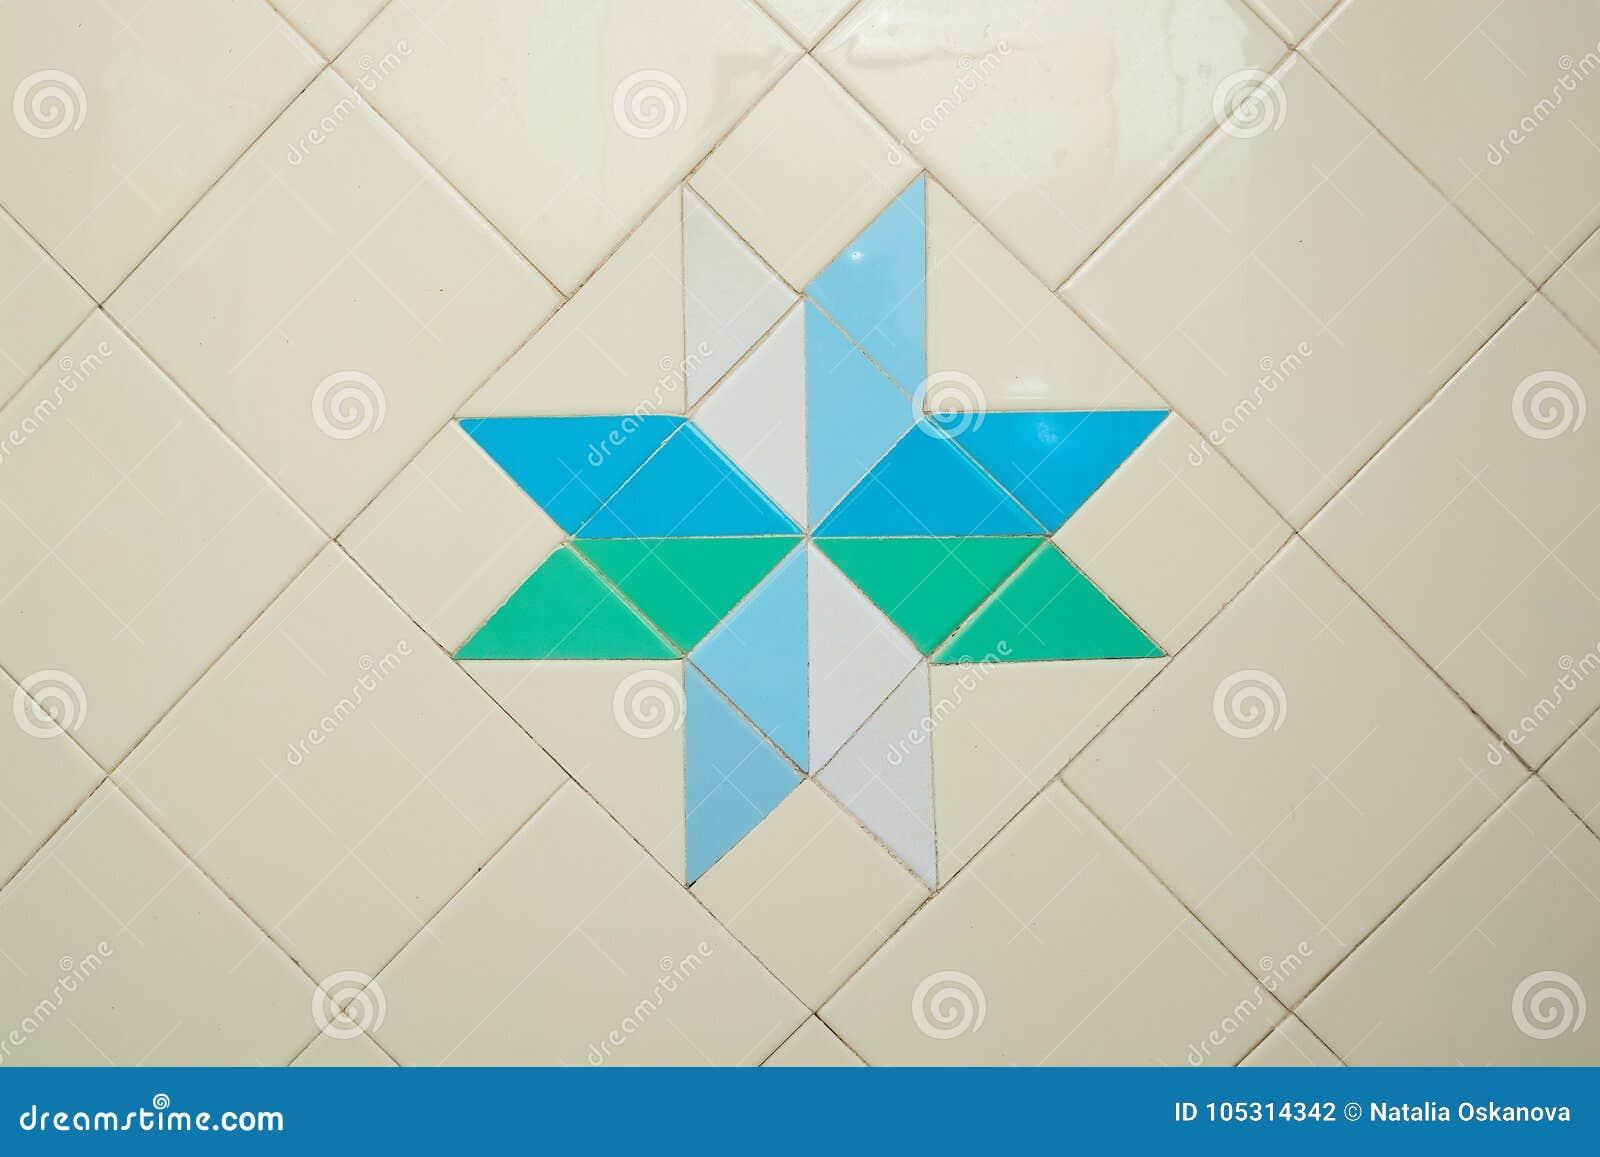 White Bathroom Tiles Texture Background Stock Photo - Image of ...